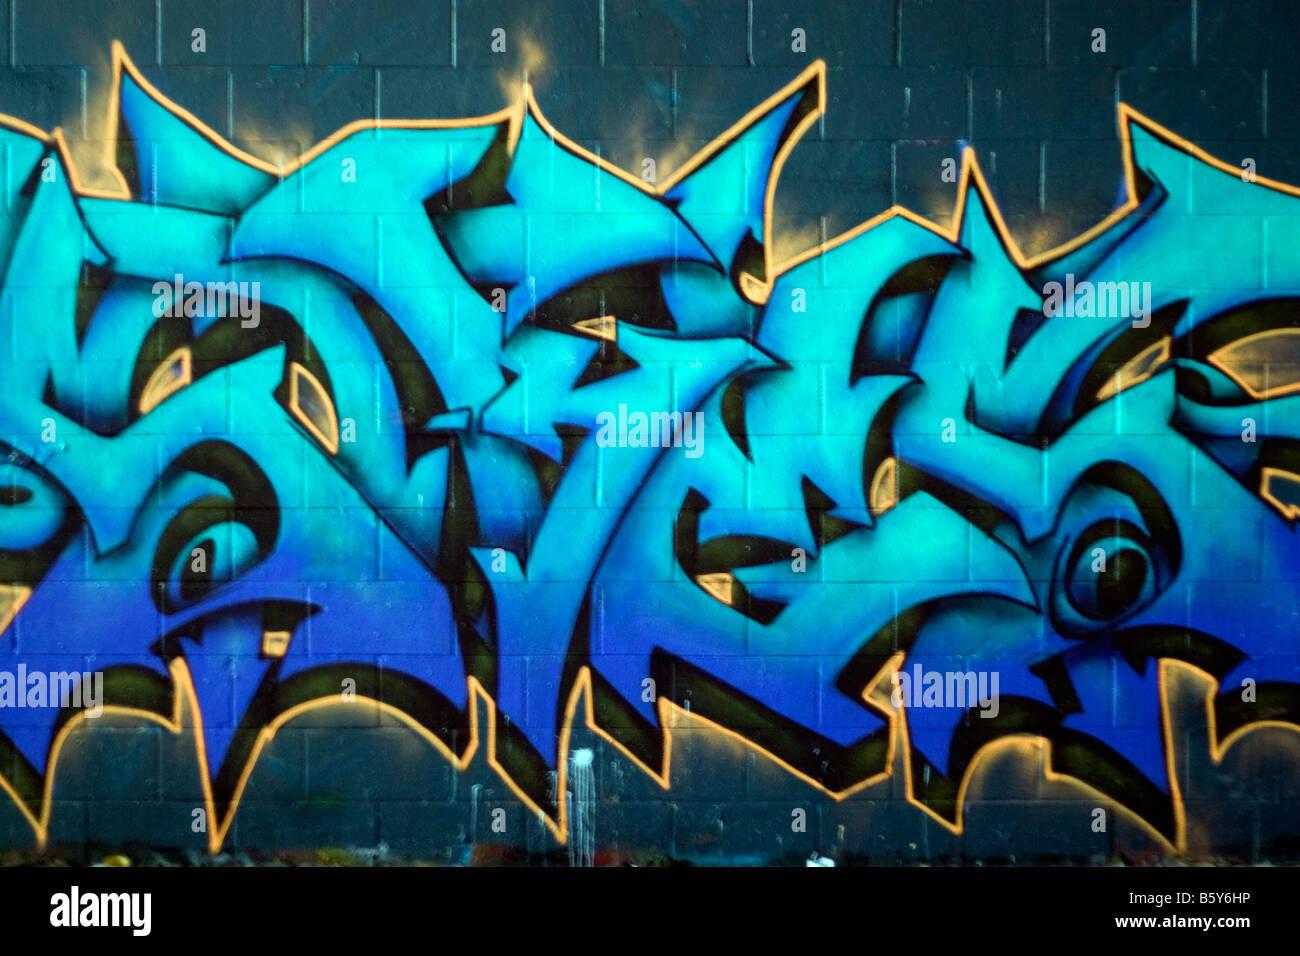 Coole graffiti hintergrunde